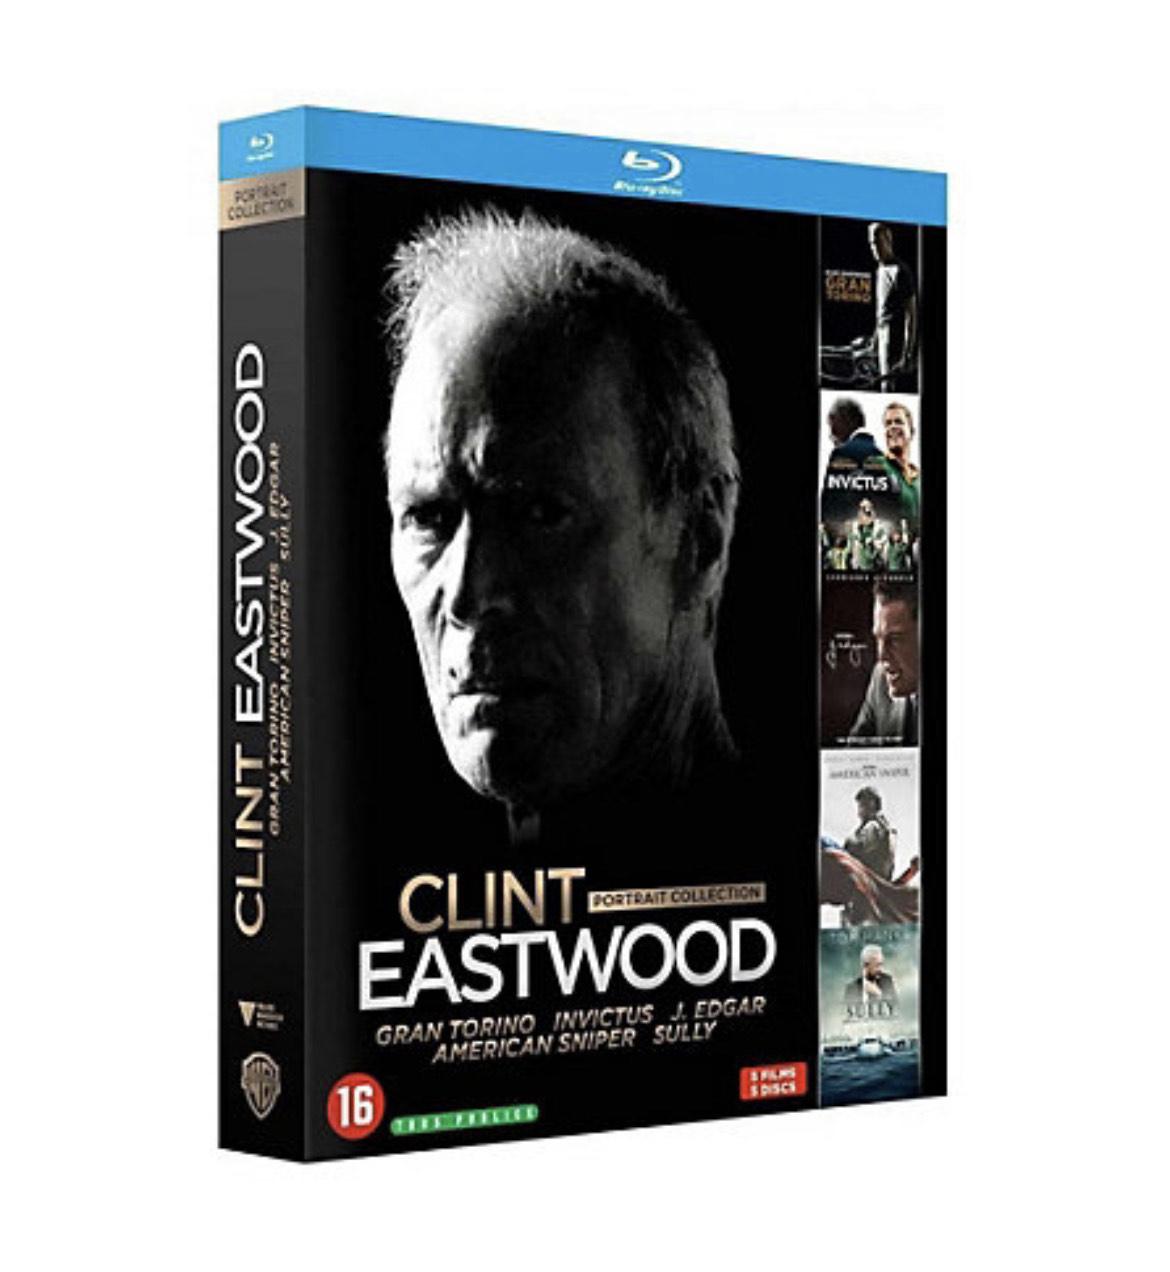 Coffret Blu-ray Clint Eastwood - 5 films